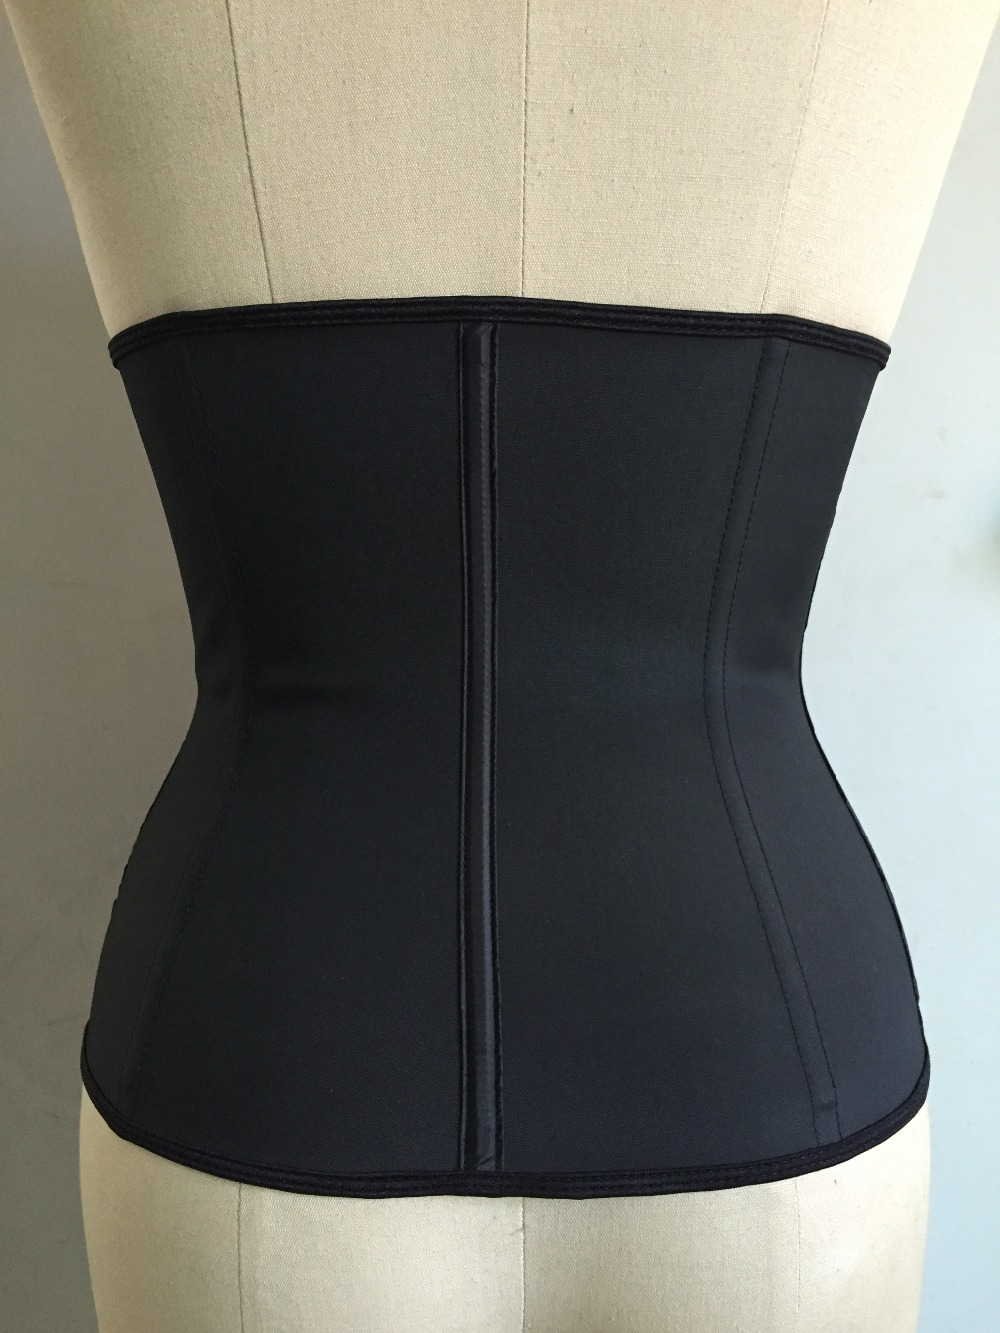 Meisou New Latex Waist Trainer Body Shaper Women Corset with Zipper Hot Shaper Cincher Corset Top Slimming Belt Black Plus Size (14)